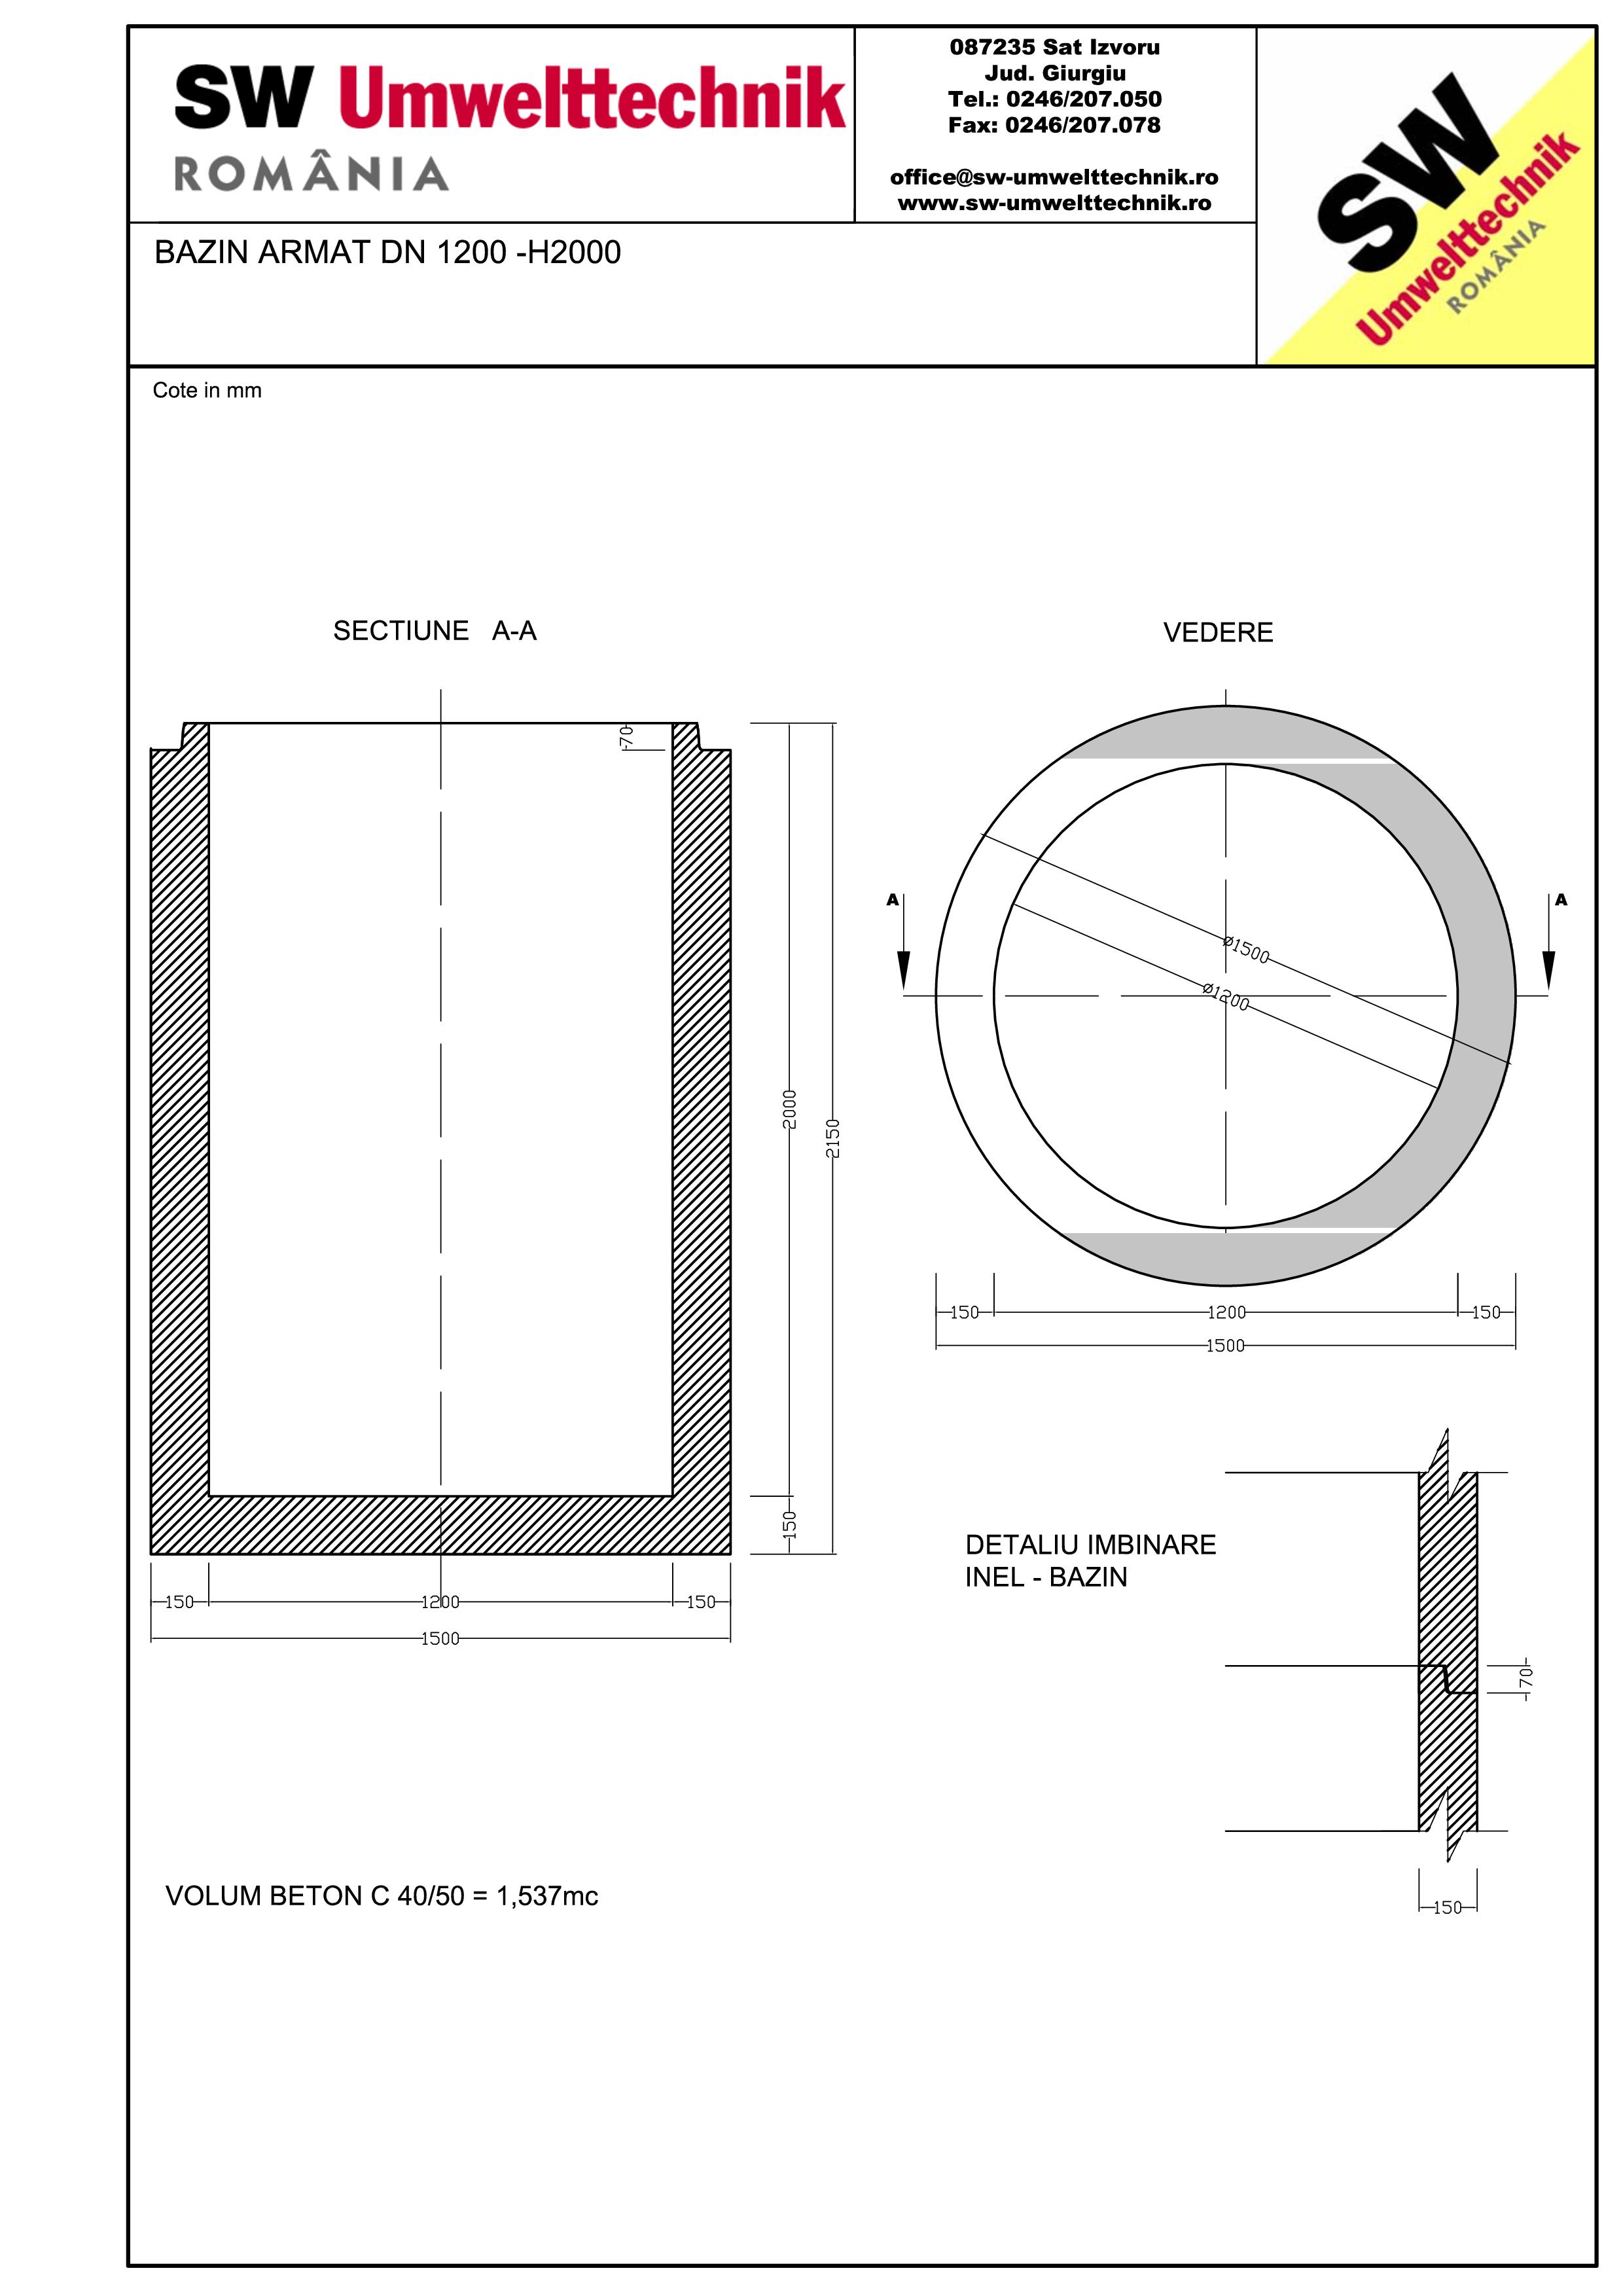 Pagina 1 - CAD-PDF Bazin armat DN1200 H2000 SW UMWELTTECHNIK Detaliu de produs